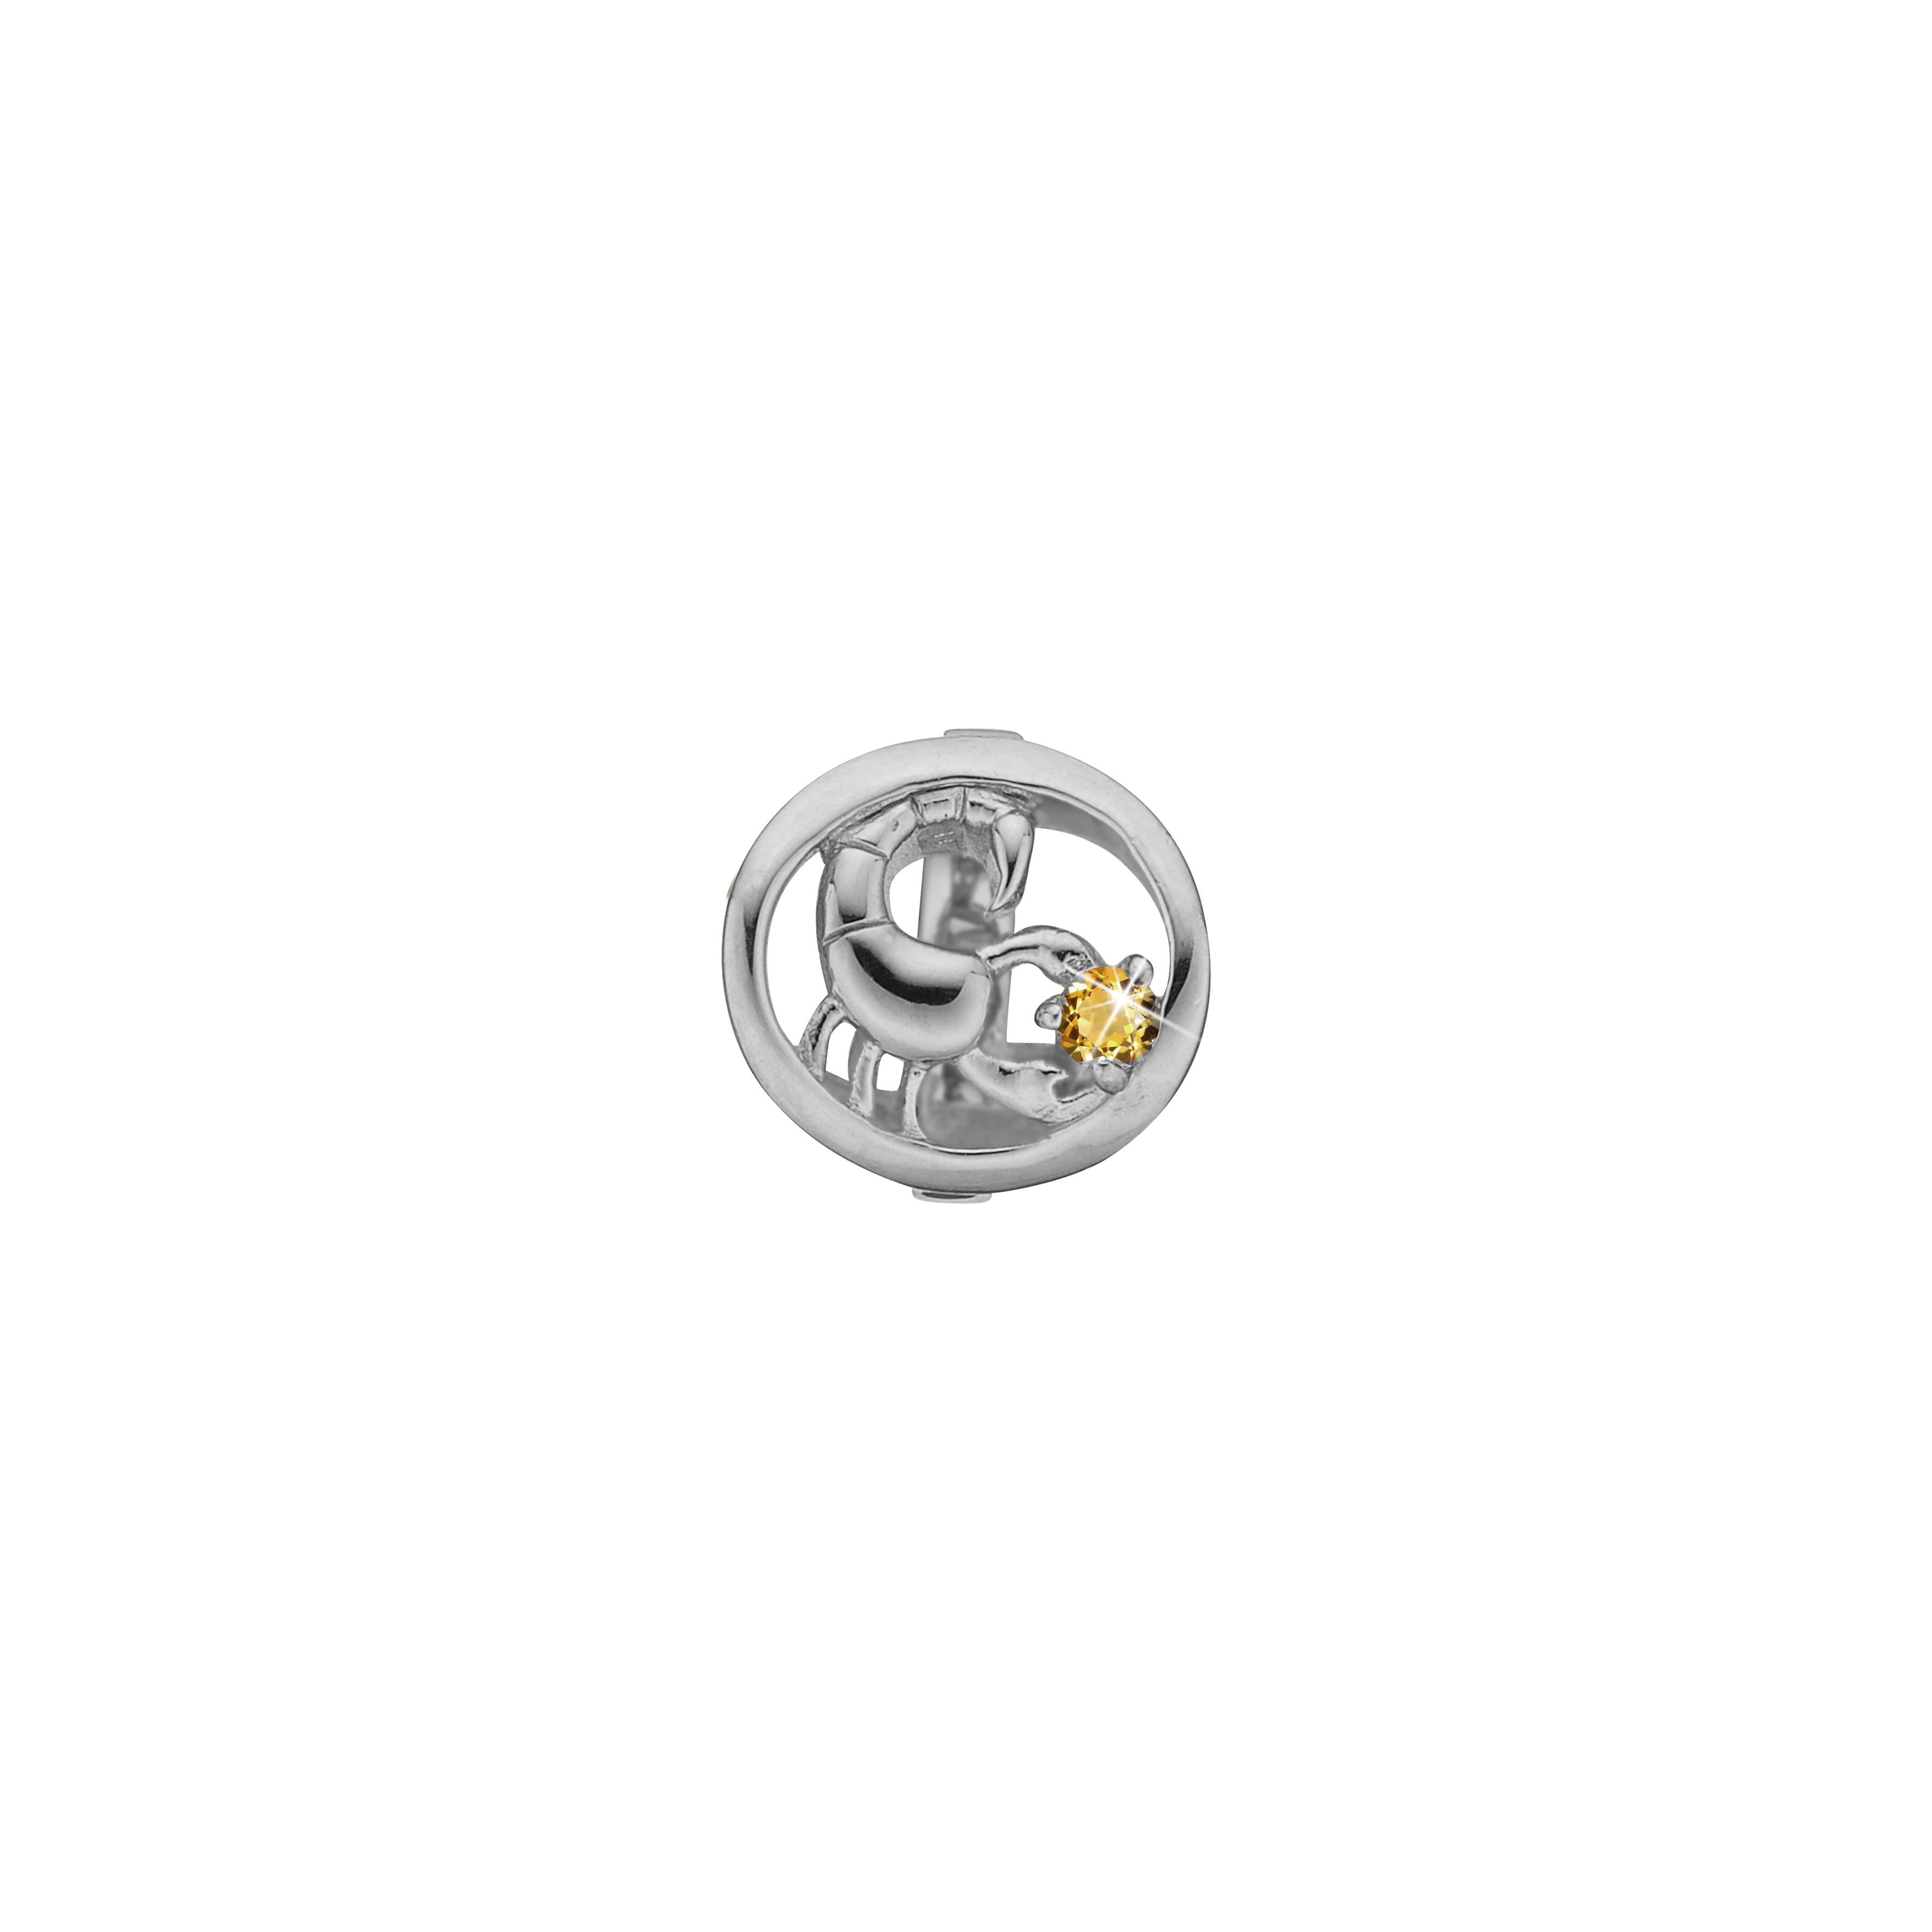 CHRISTINA Charm skorpion - 630-S67-10